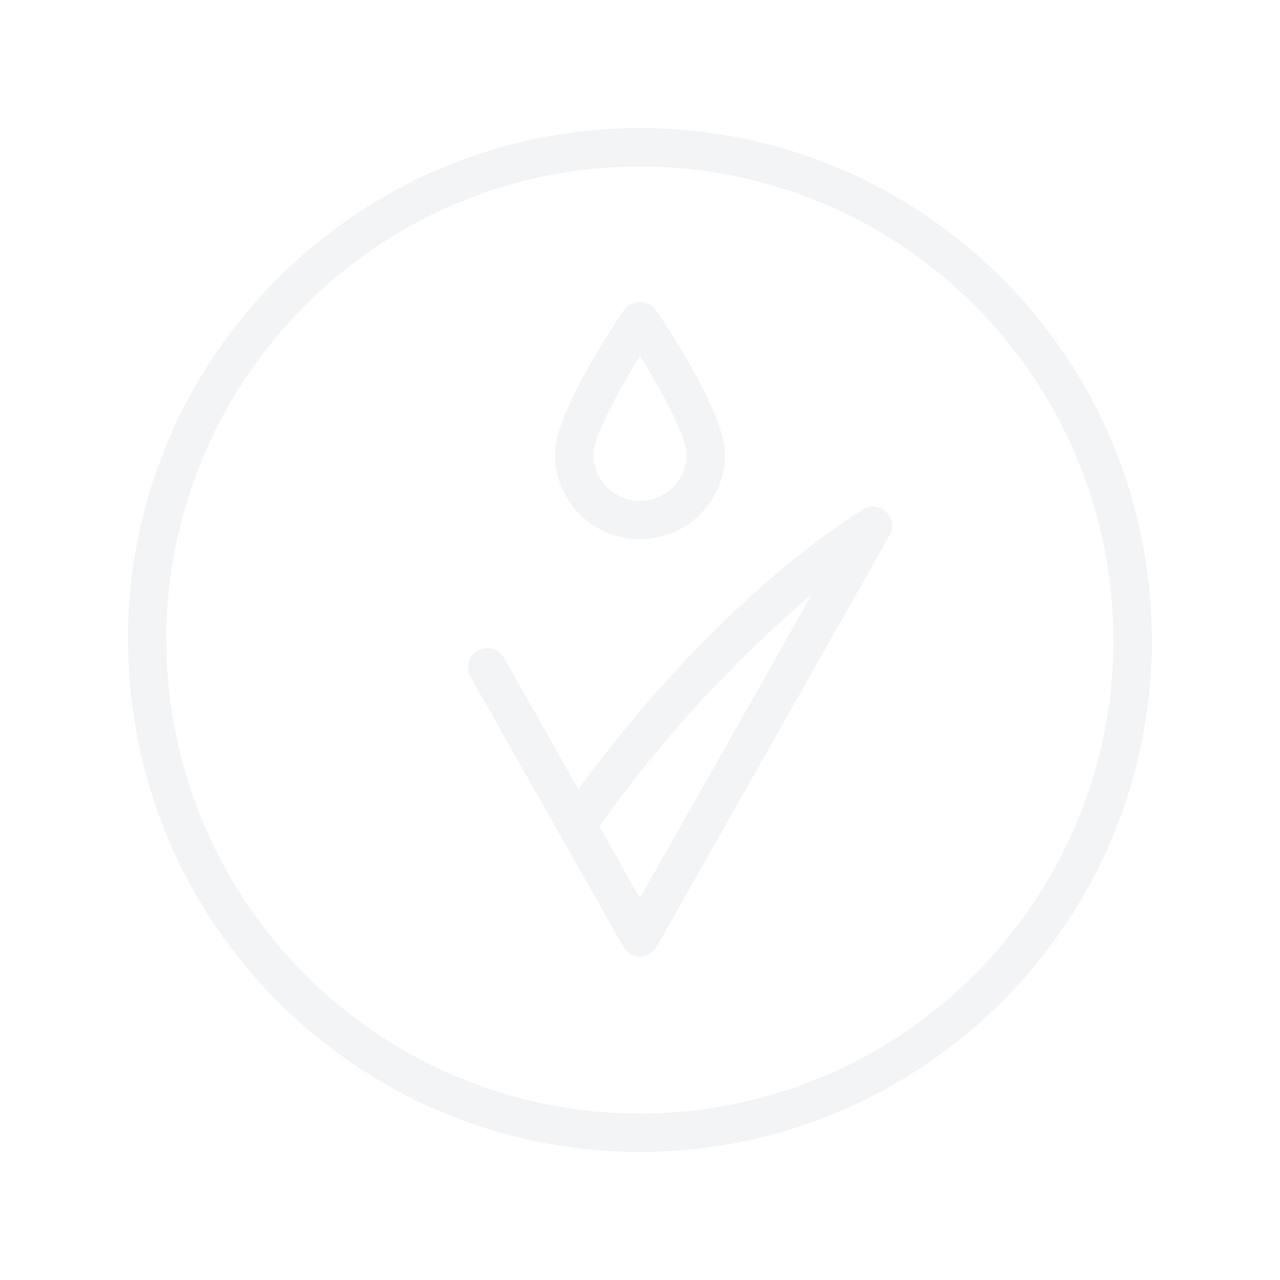 MAKEUP REVOLUTION Freedom Pro Eyebrow Kit 4g